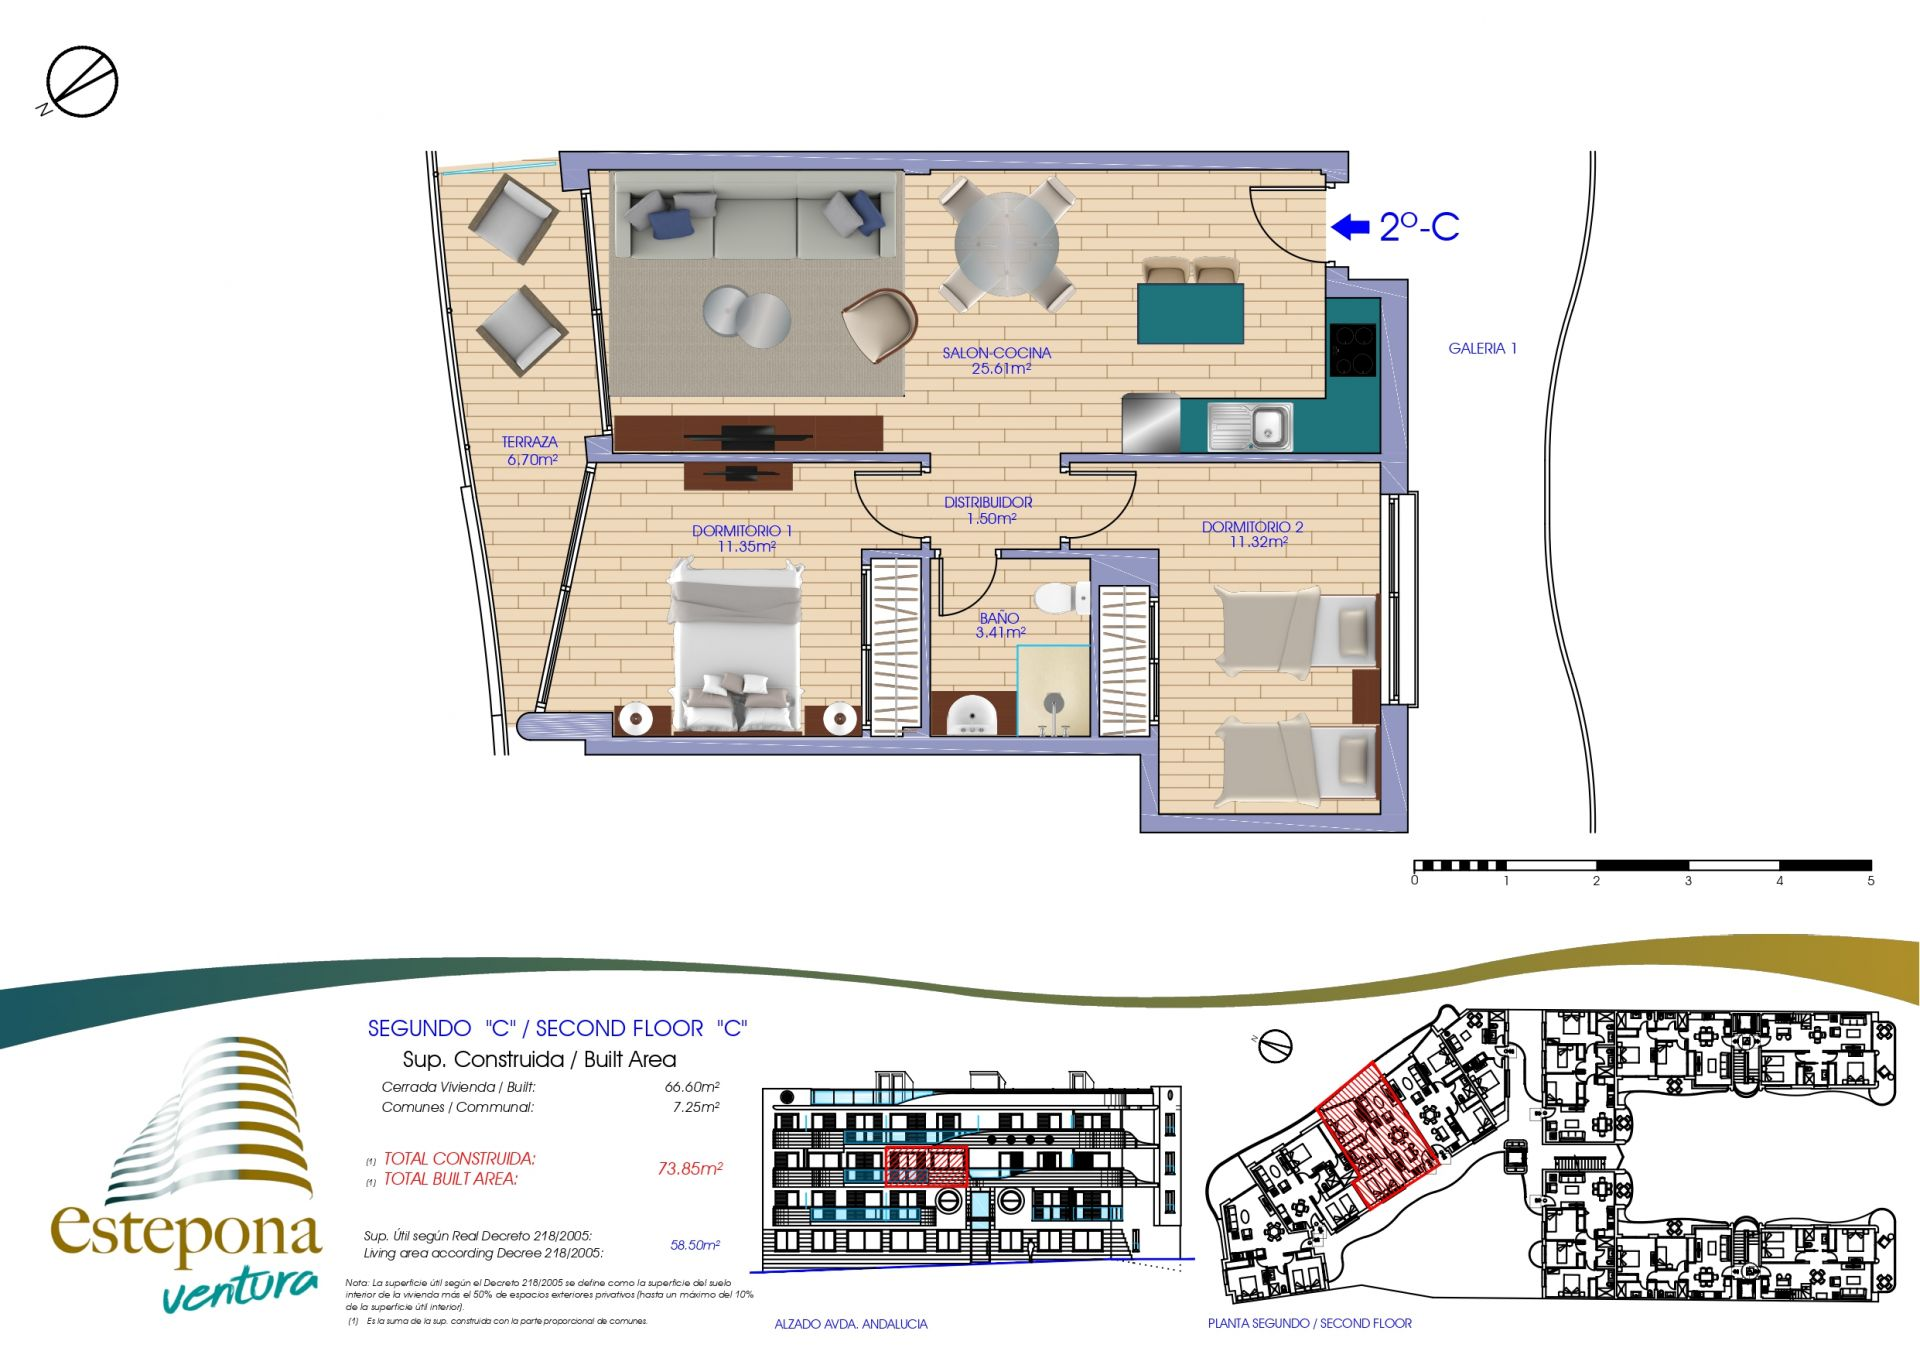 2c - Ventura Estepona | Compra de casa en Estepona